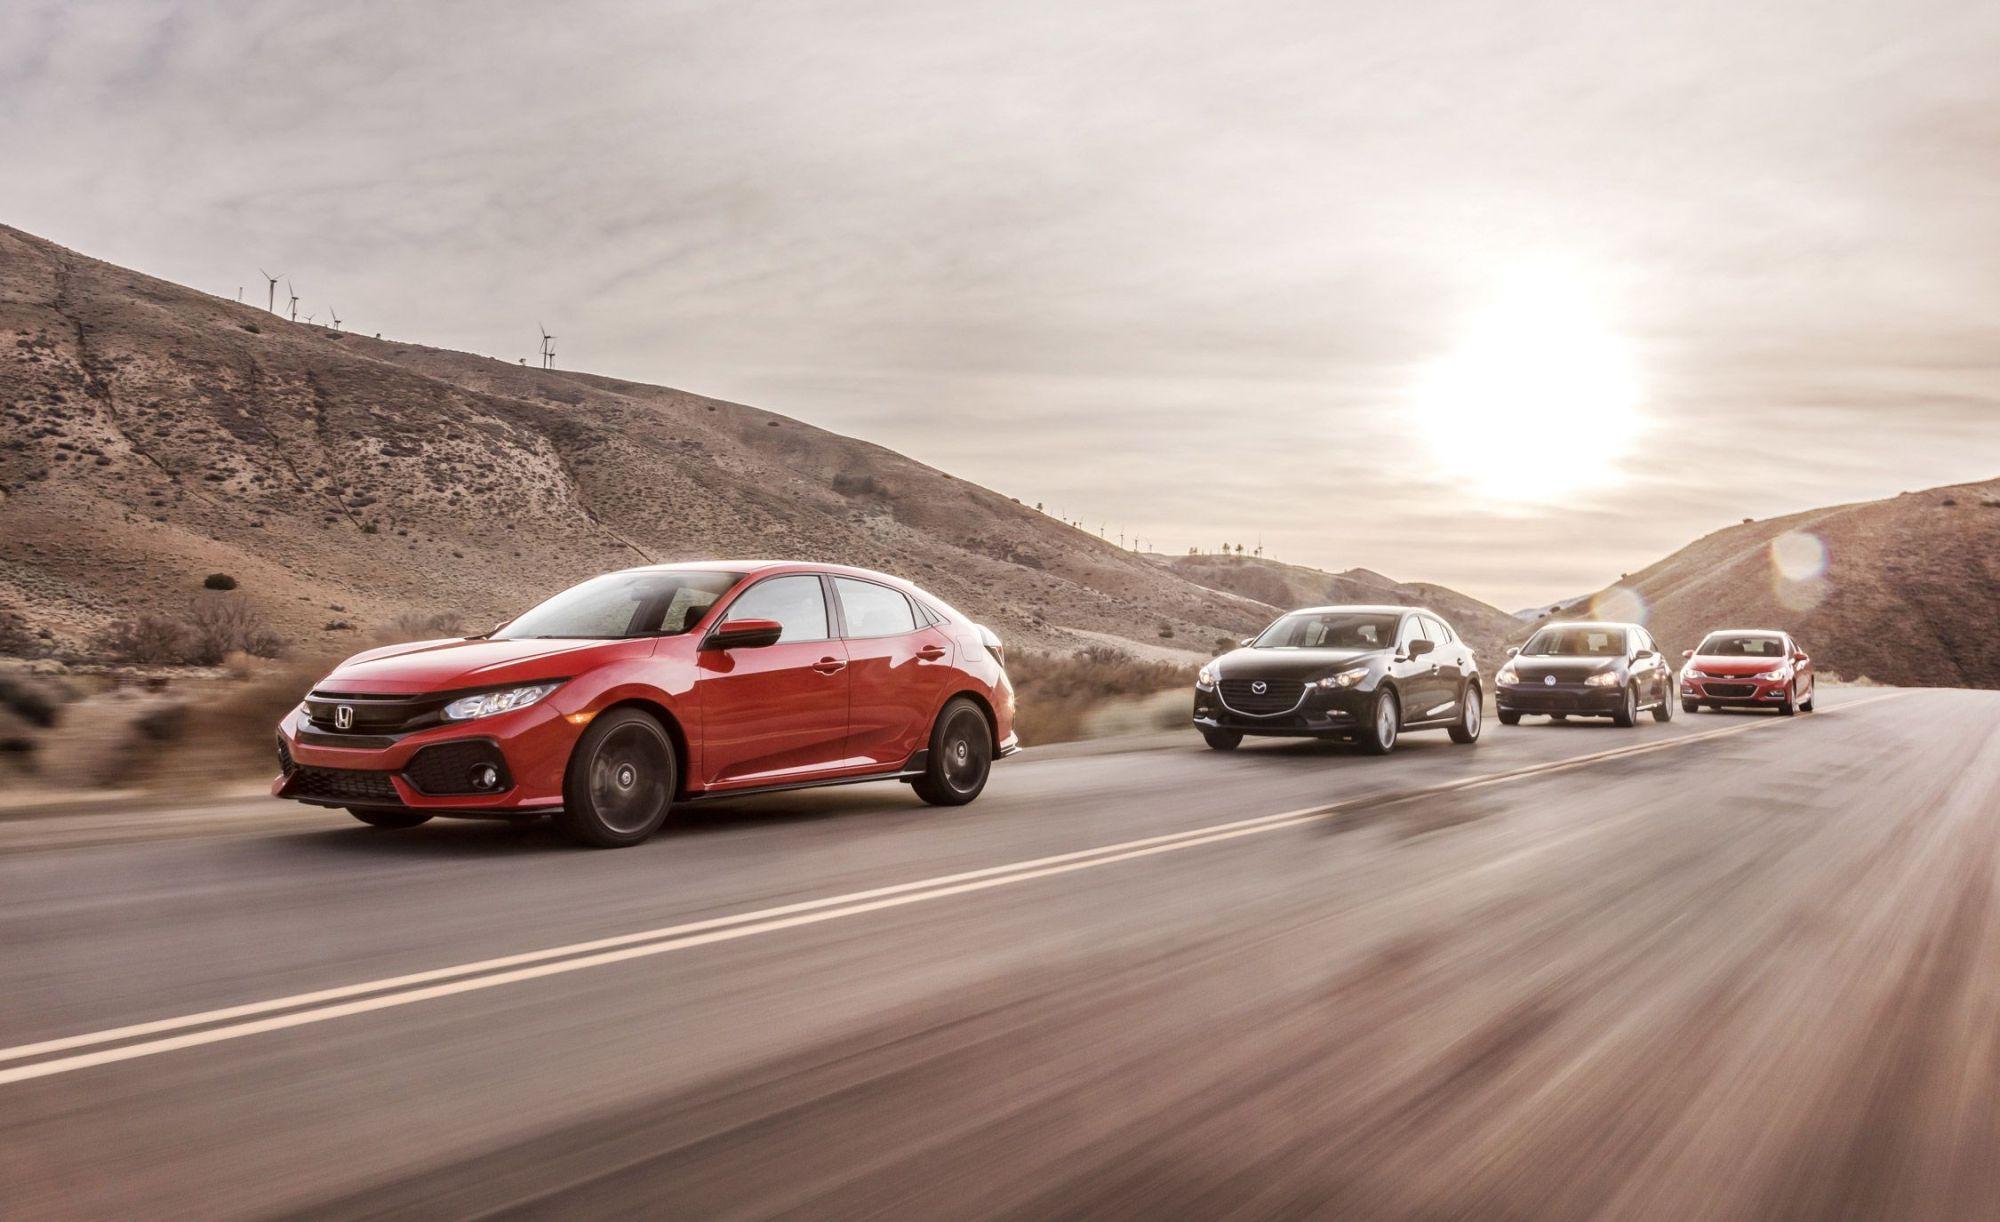 hight resolution of 2017 honda civic hatchback vs chevy cruze mazda 3 vw golf comparison test car and driver